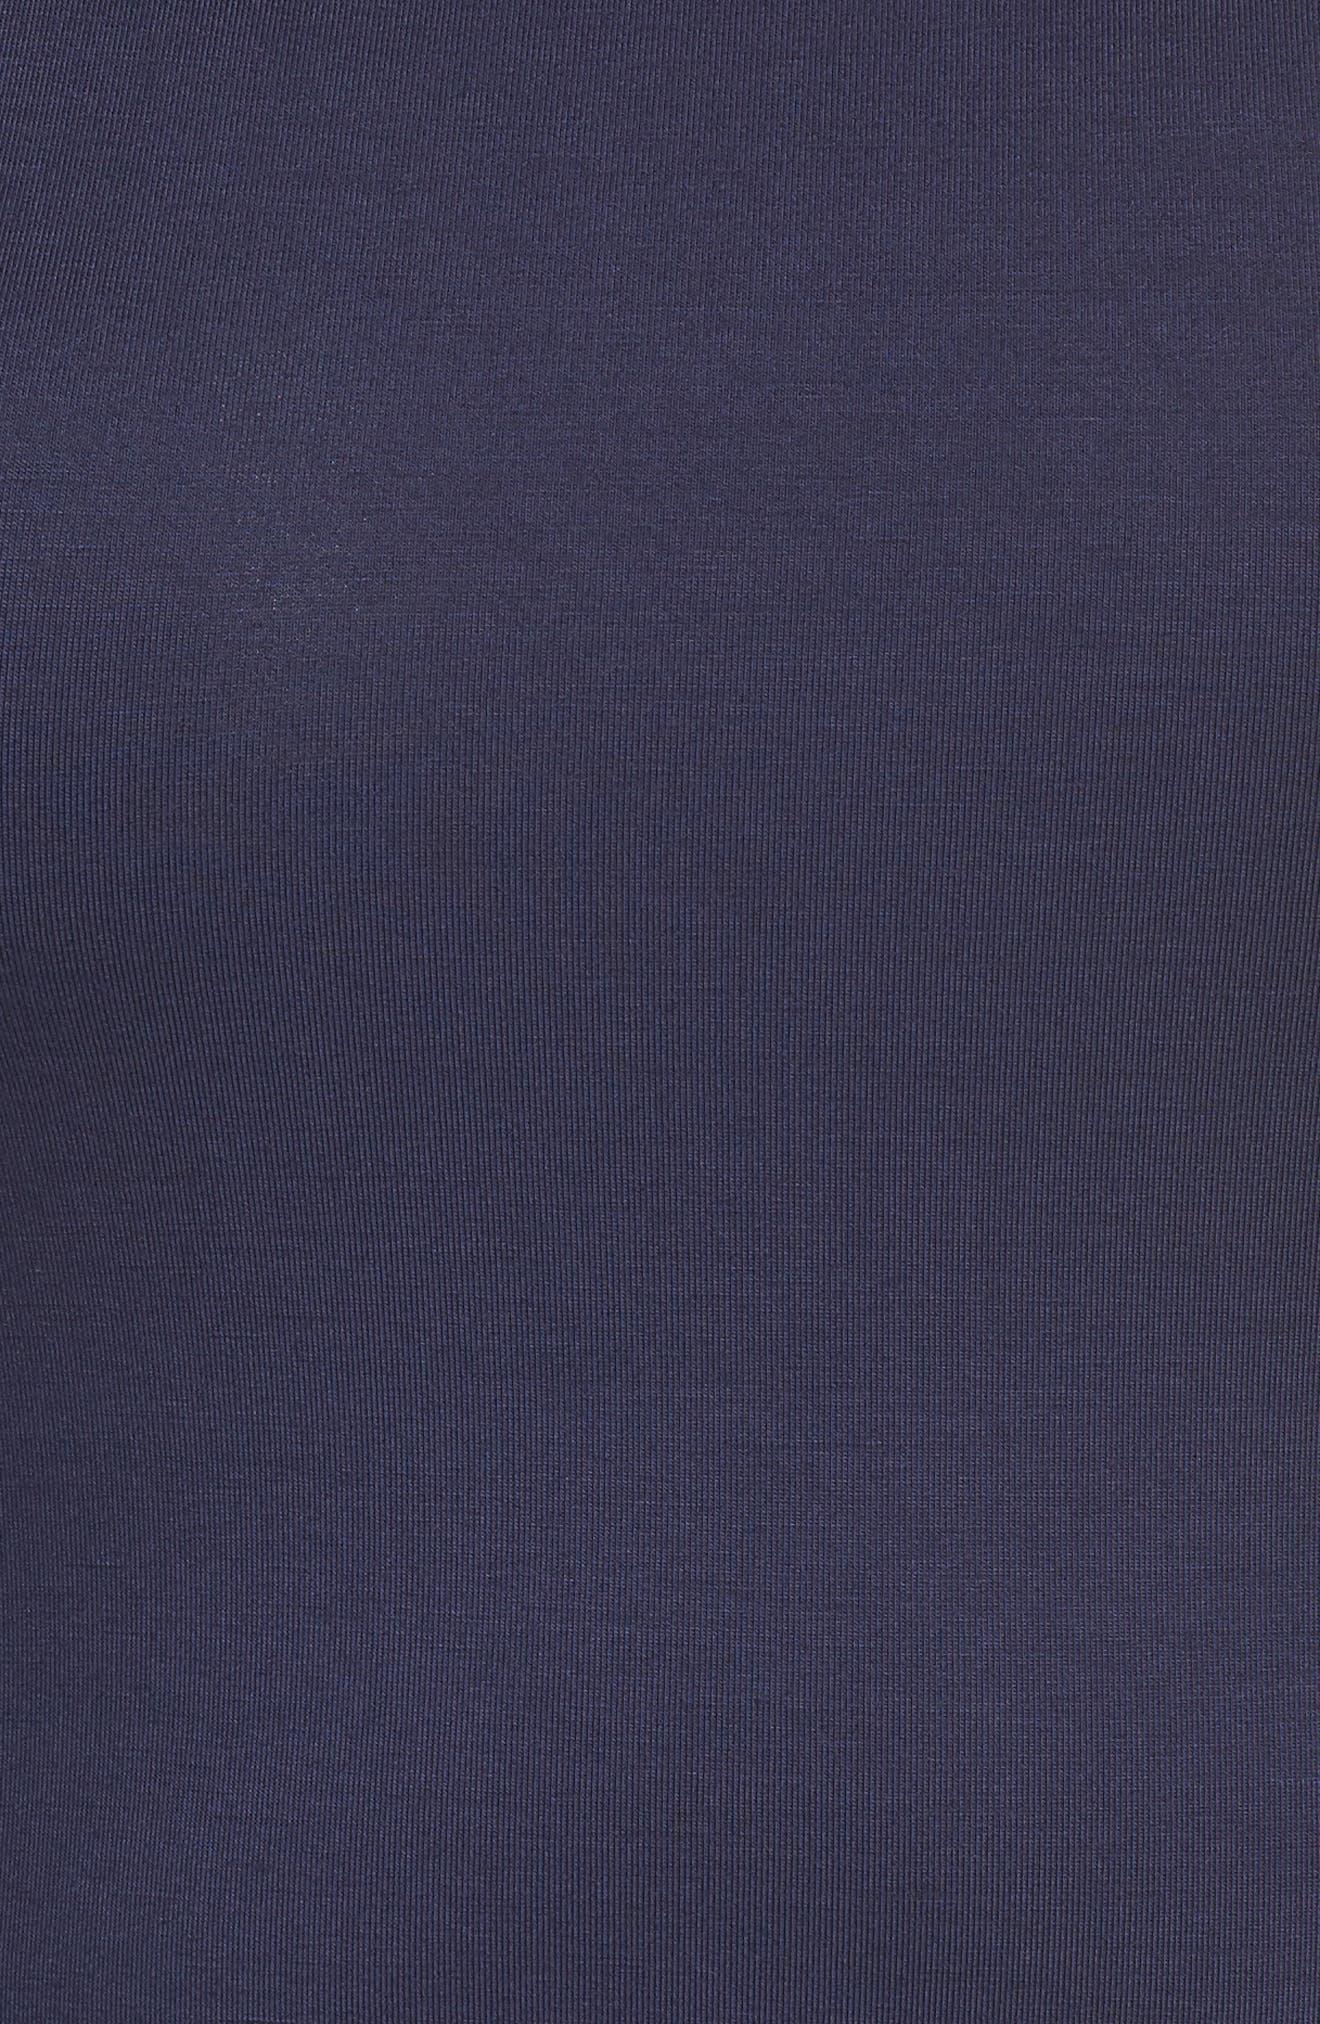 Metallic Crewneck Shift Dress,                             Alternate thumbnail 6, color,                             True Navy